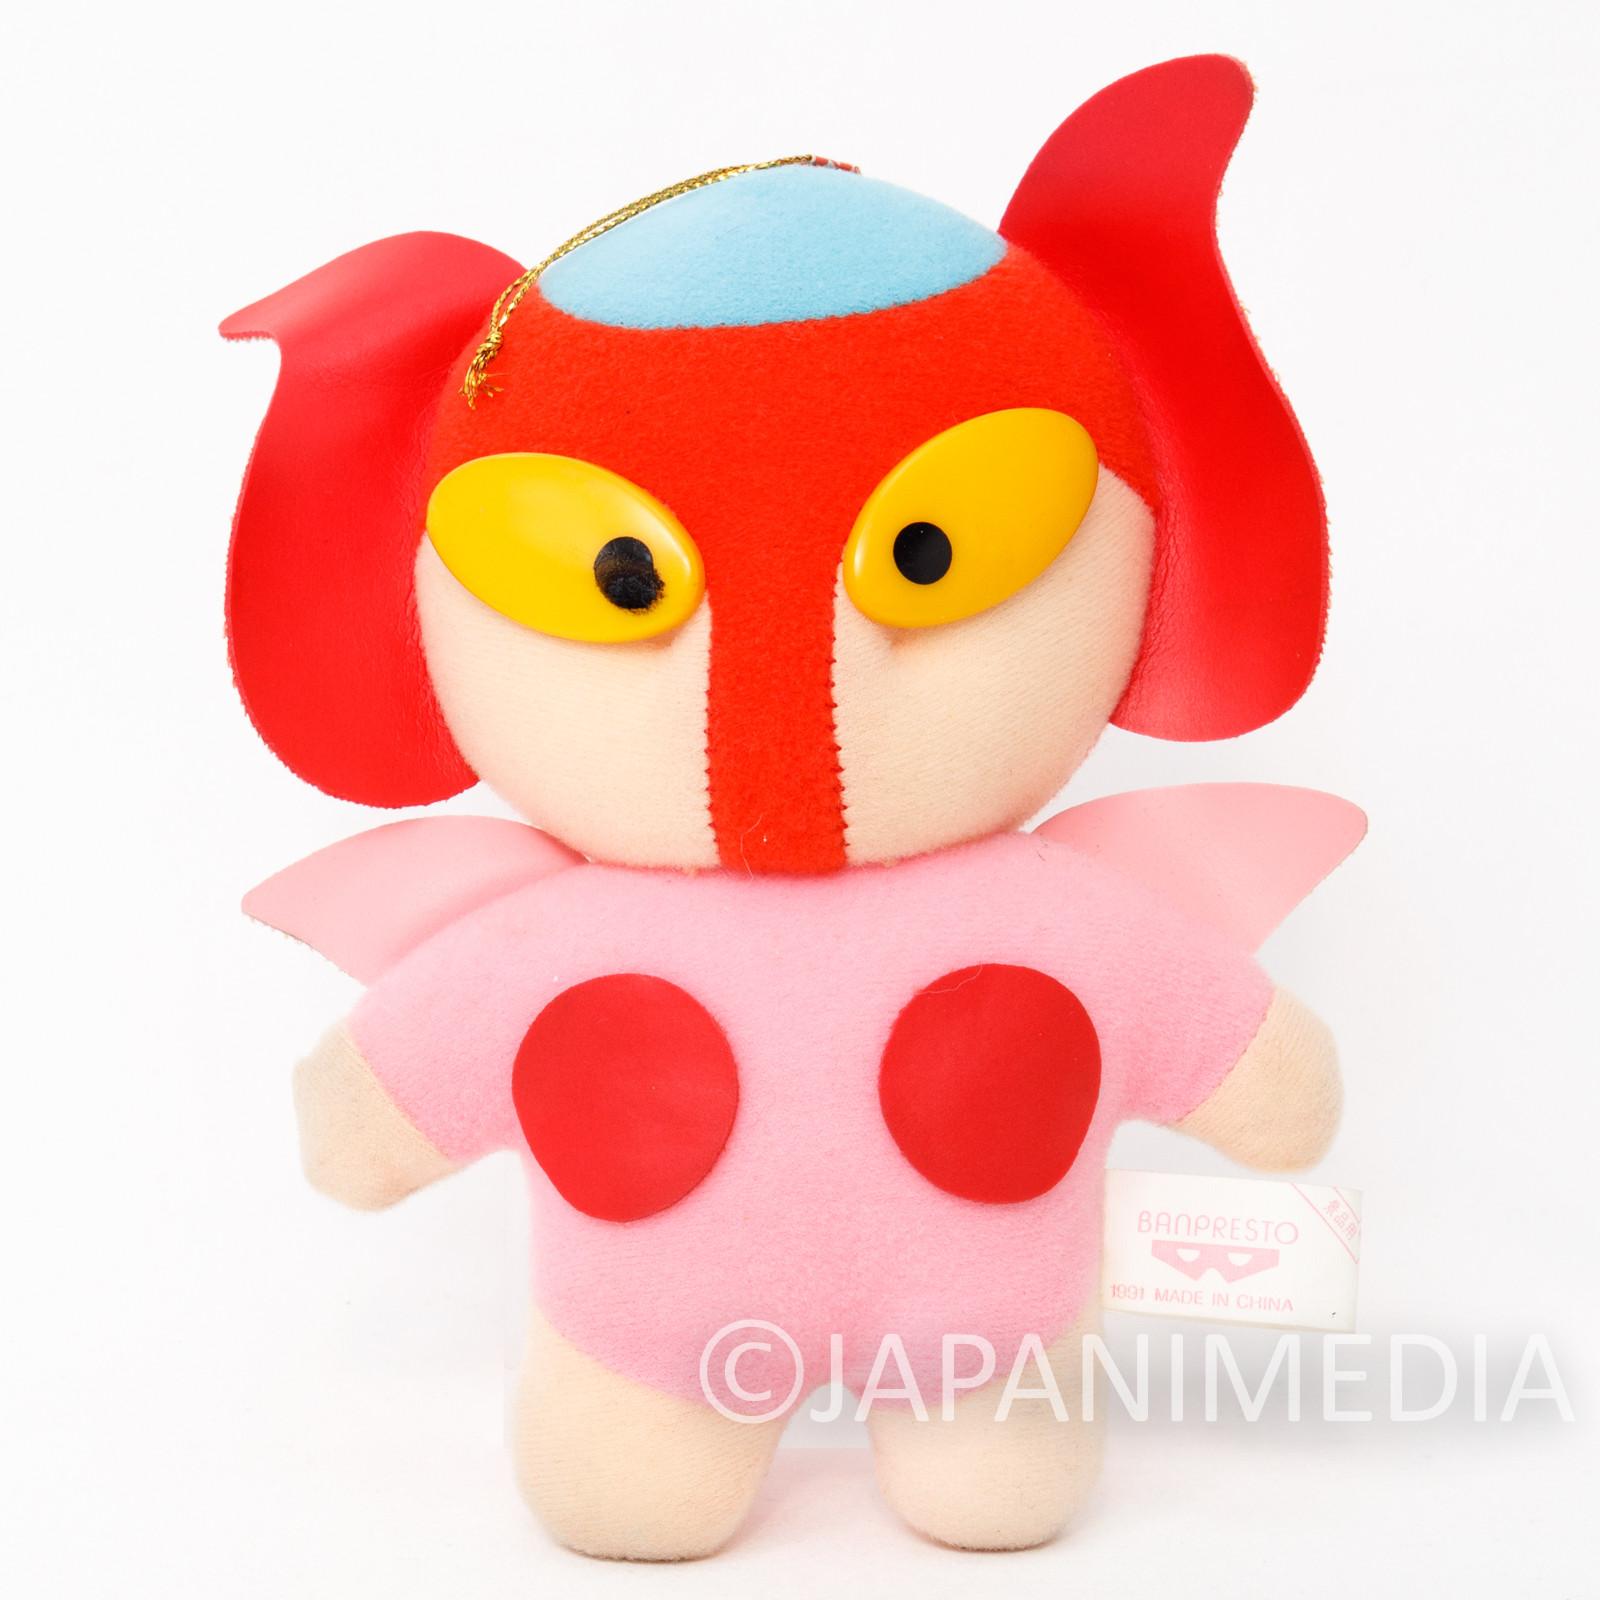 Mazinger Z Aphrodie A Plush Doll Banpresto JAPAN ANIME MANGA NAGAI GO